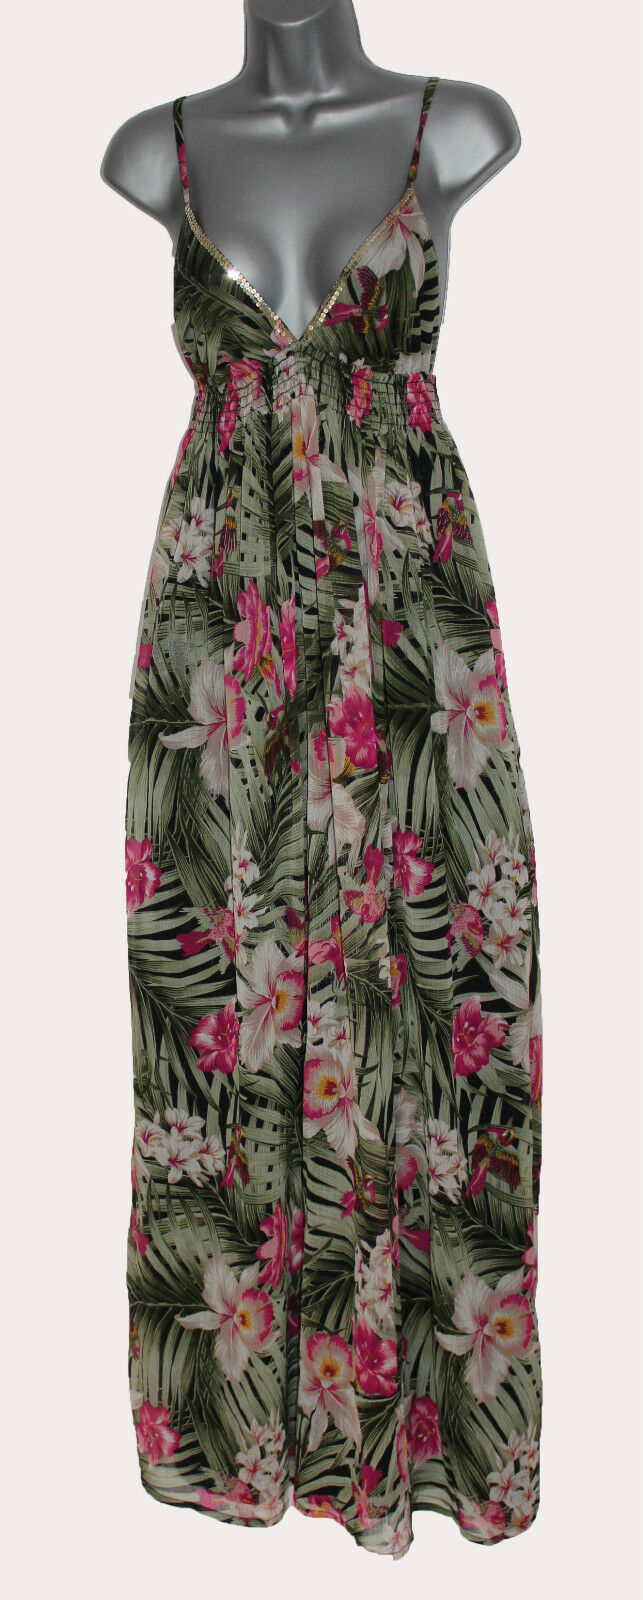 MONSOON Green Tropical Print Embellished Spaghetti Straps Summer Maxi Dress UK M